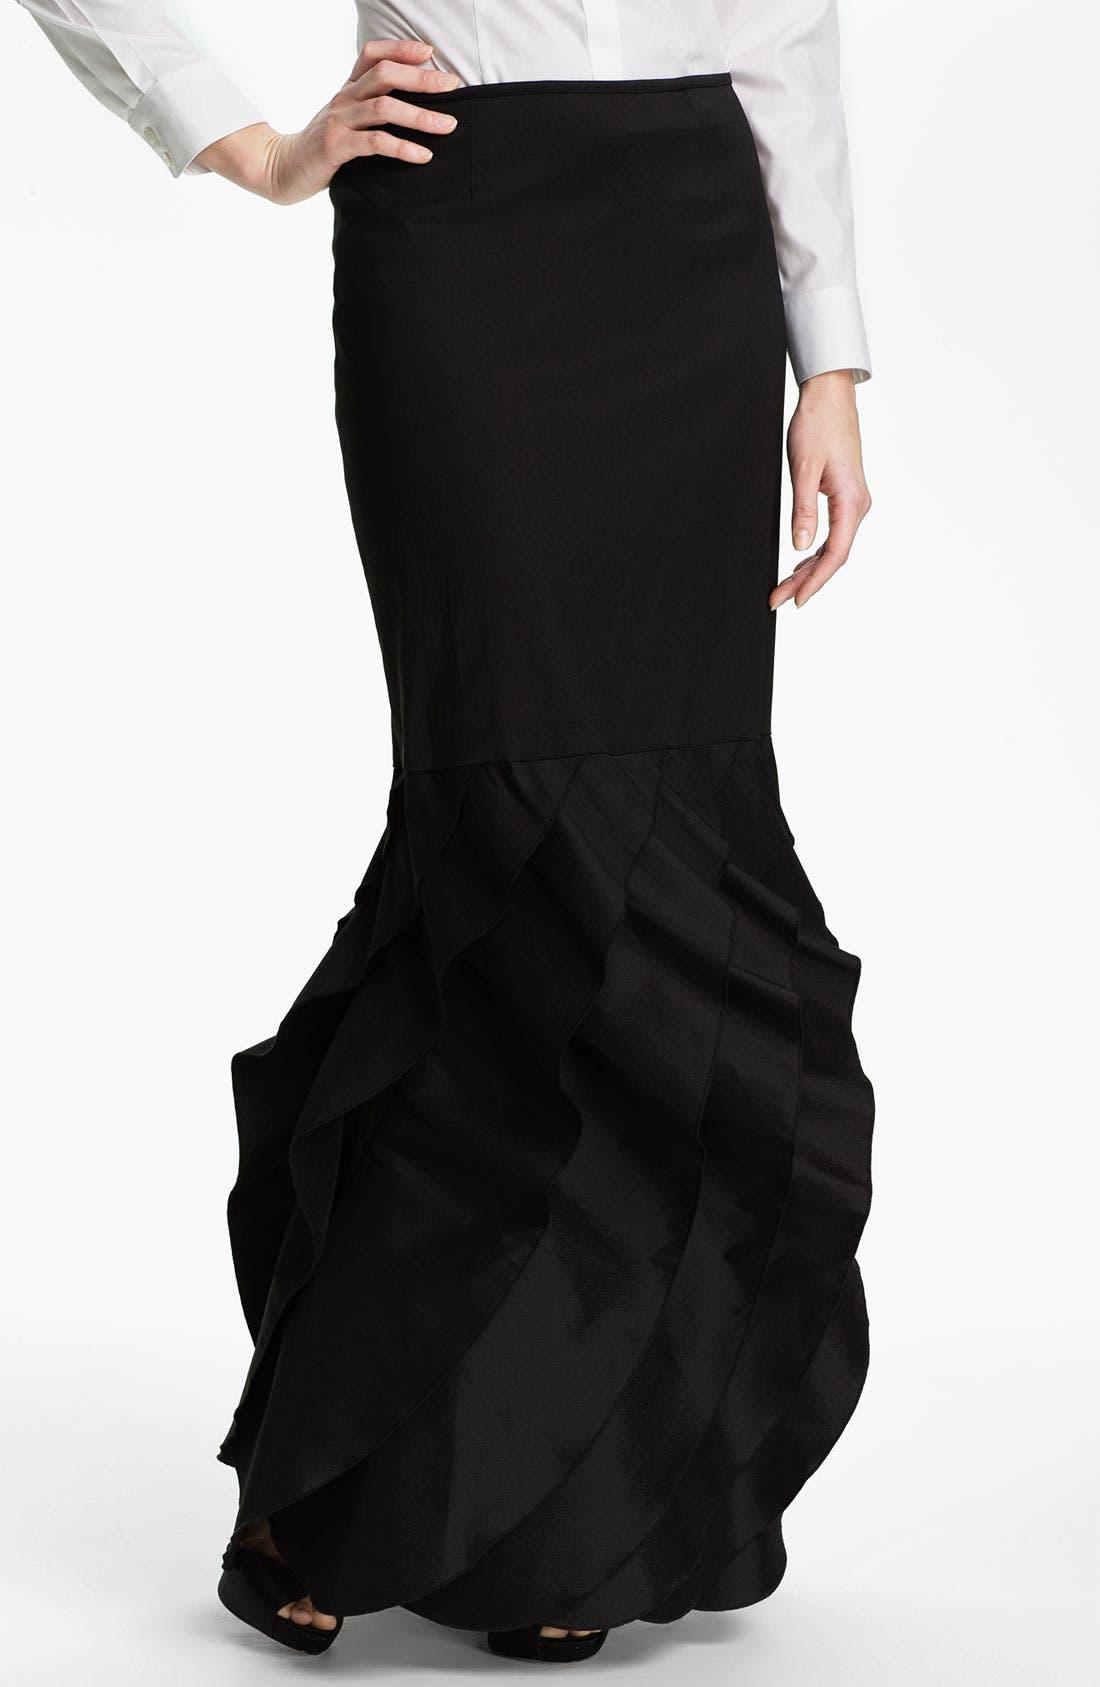 Alternate Image 1 Selected - Tadashi Shoji Tier Hem Taffeta Skirt